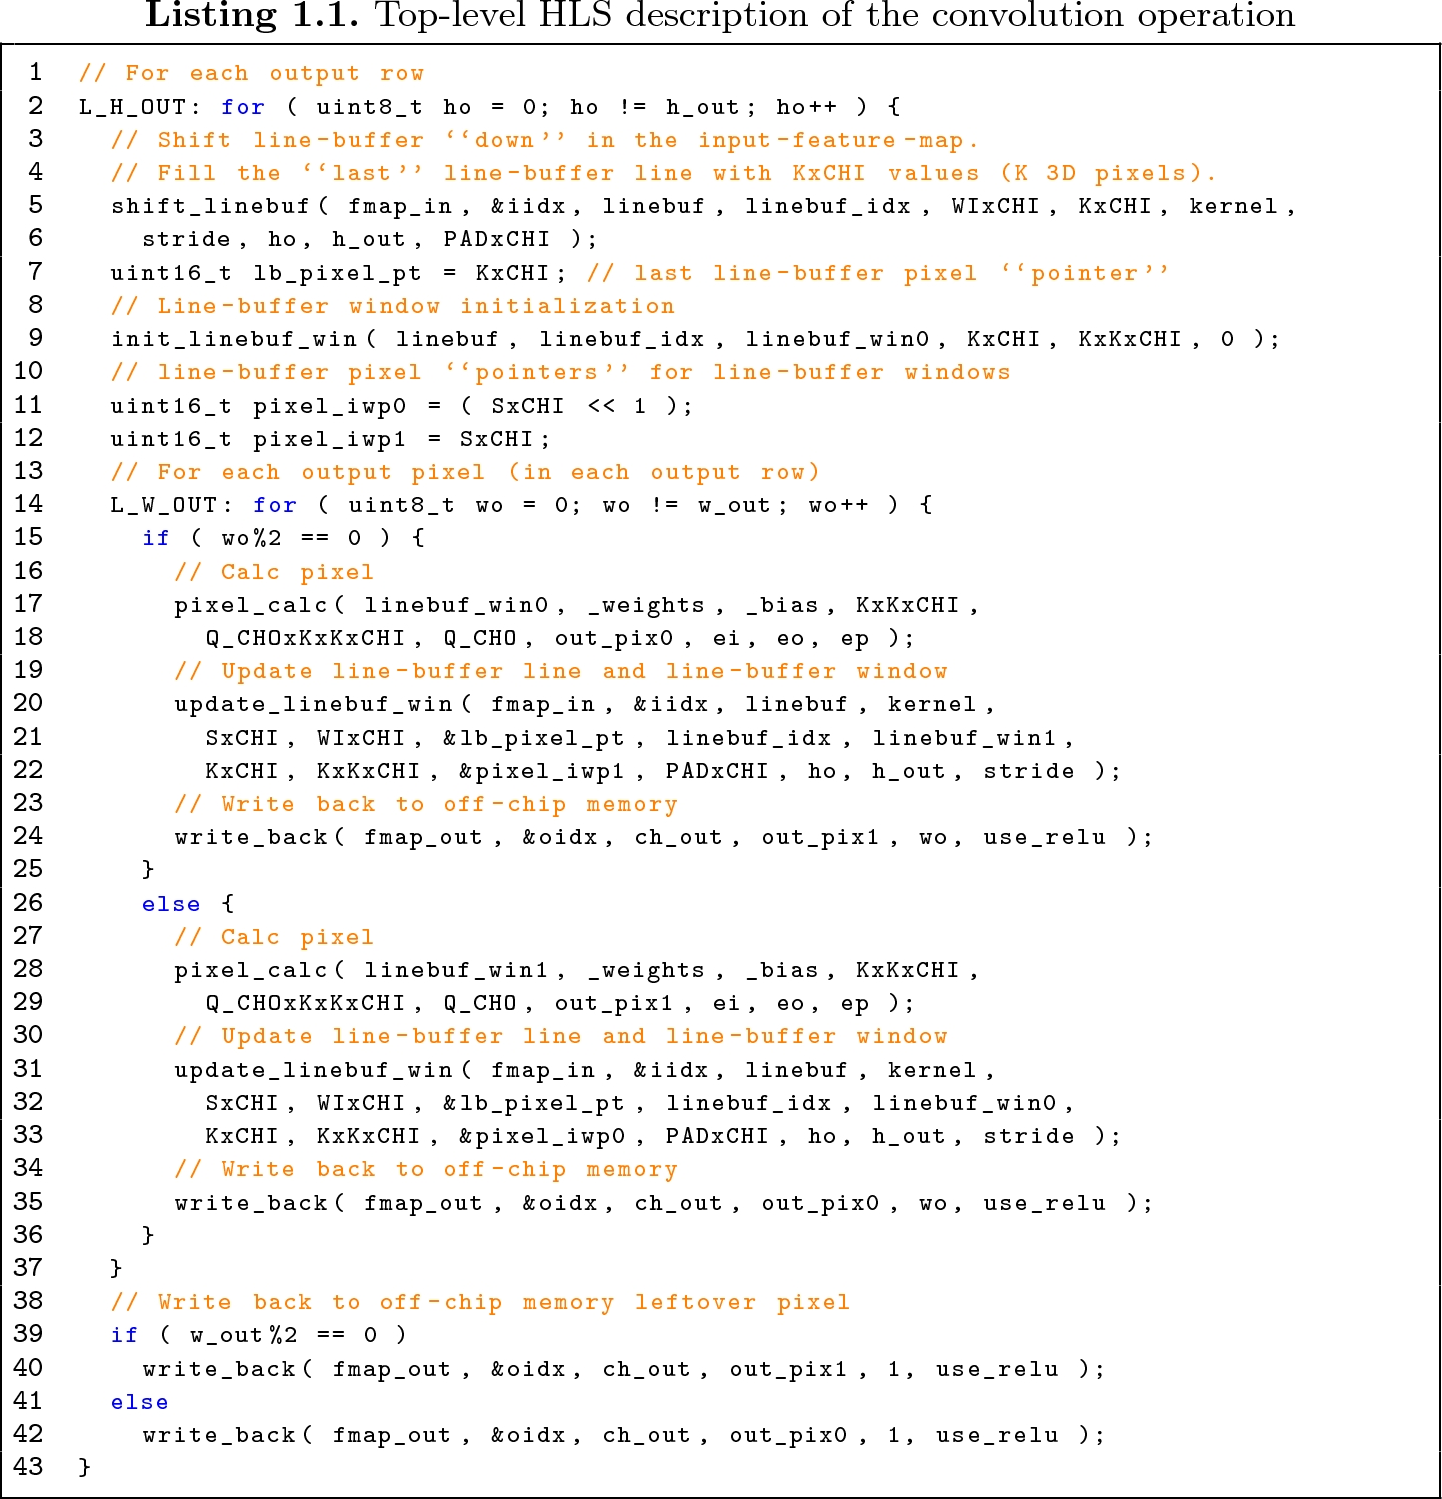 Software-Defined FPGA Accelerator Design for Mobile Deep Learning